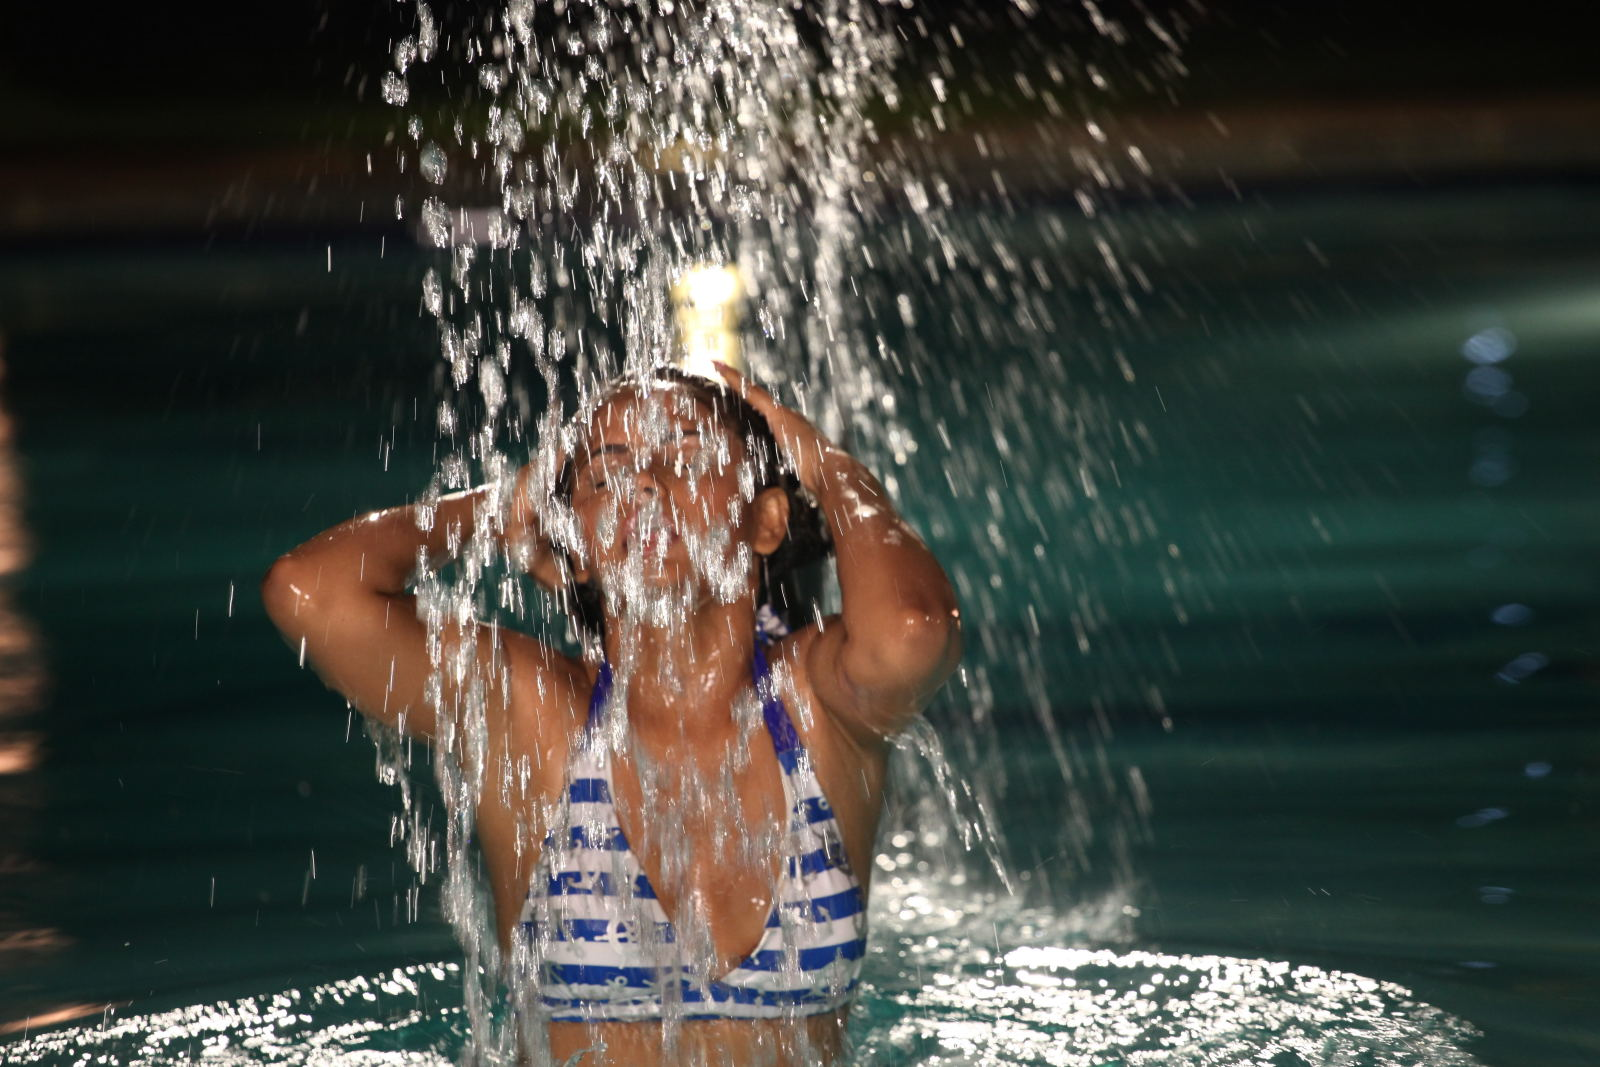 SAB HOT ACTRESS: Neetu Chandra Hot And Sexy Cleavage,Navel